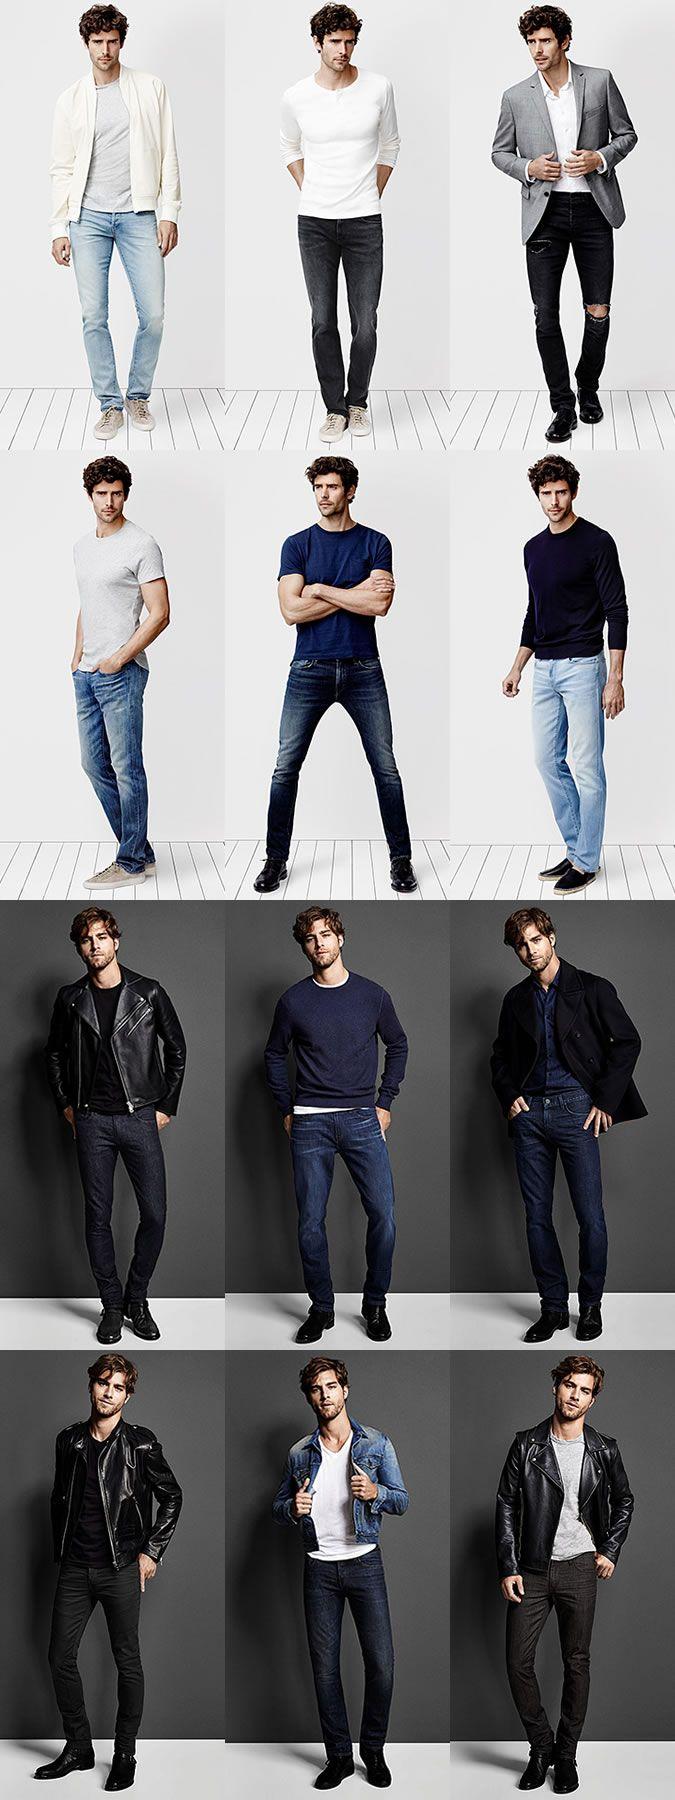 J Brand Men's Jeans Lookbook